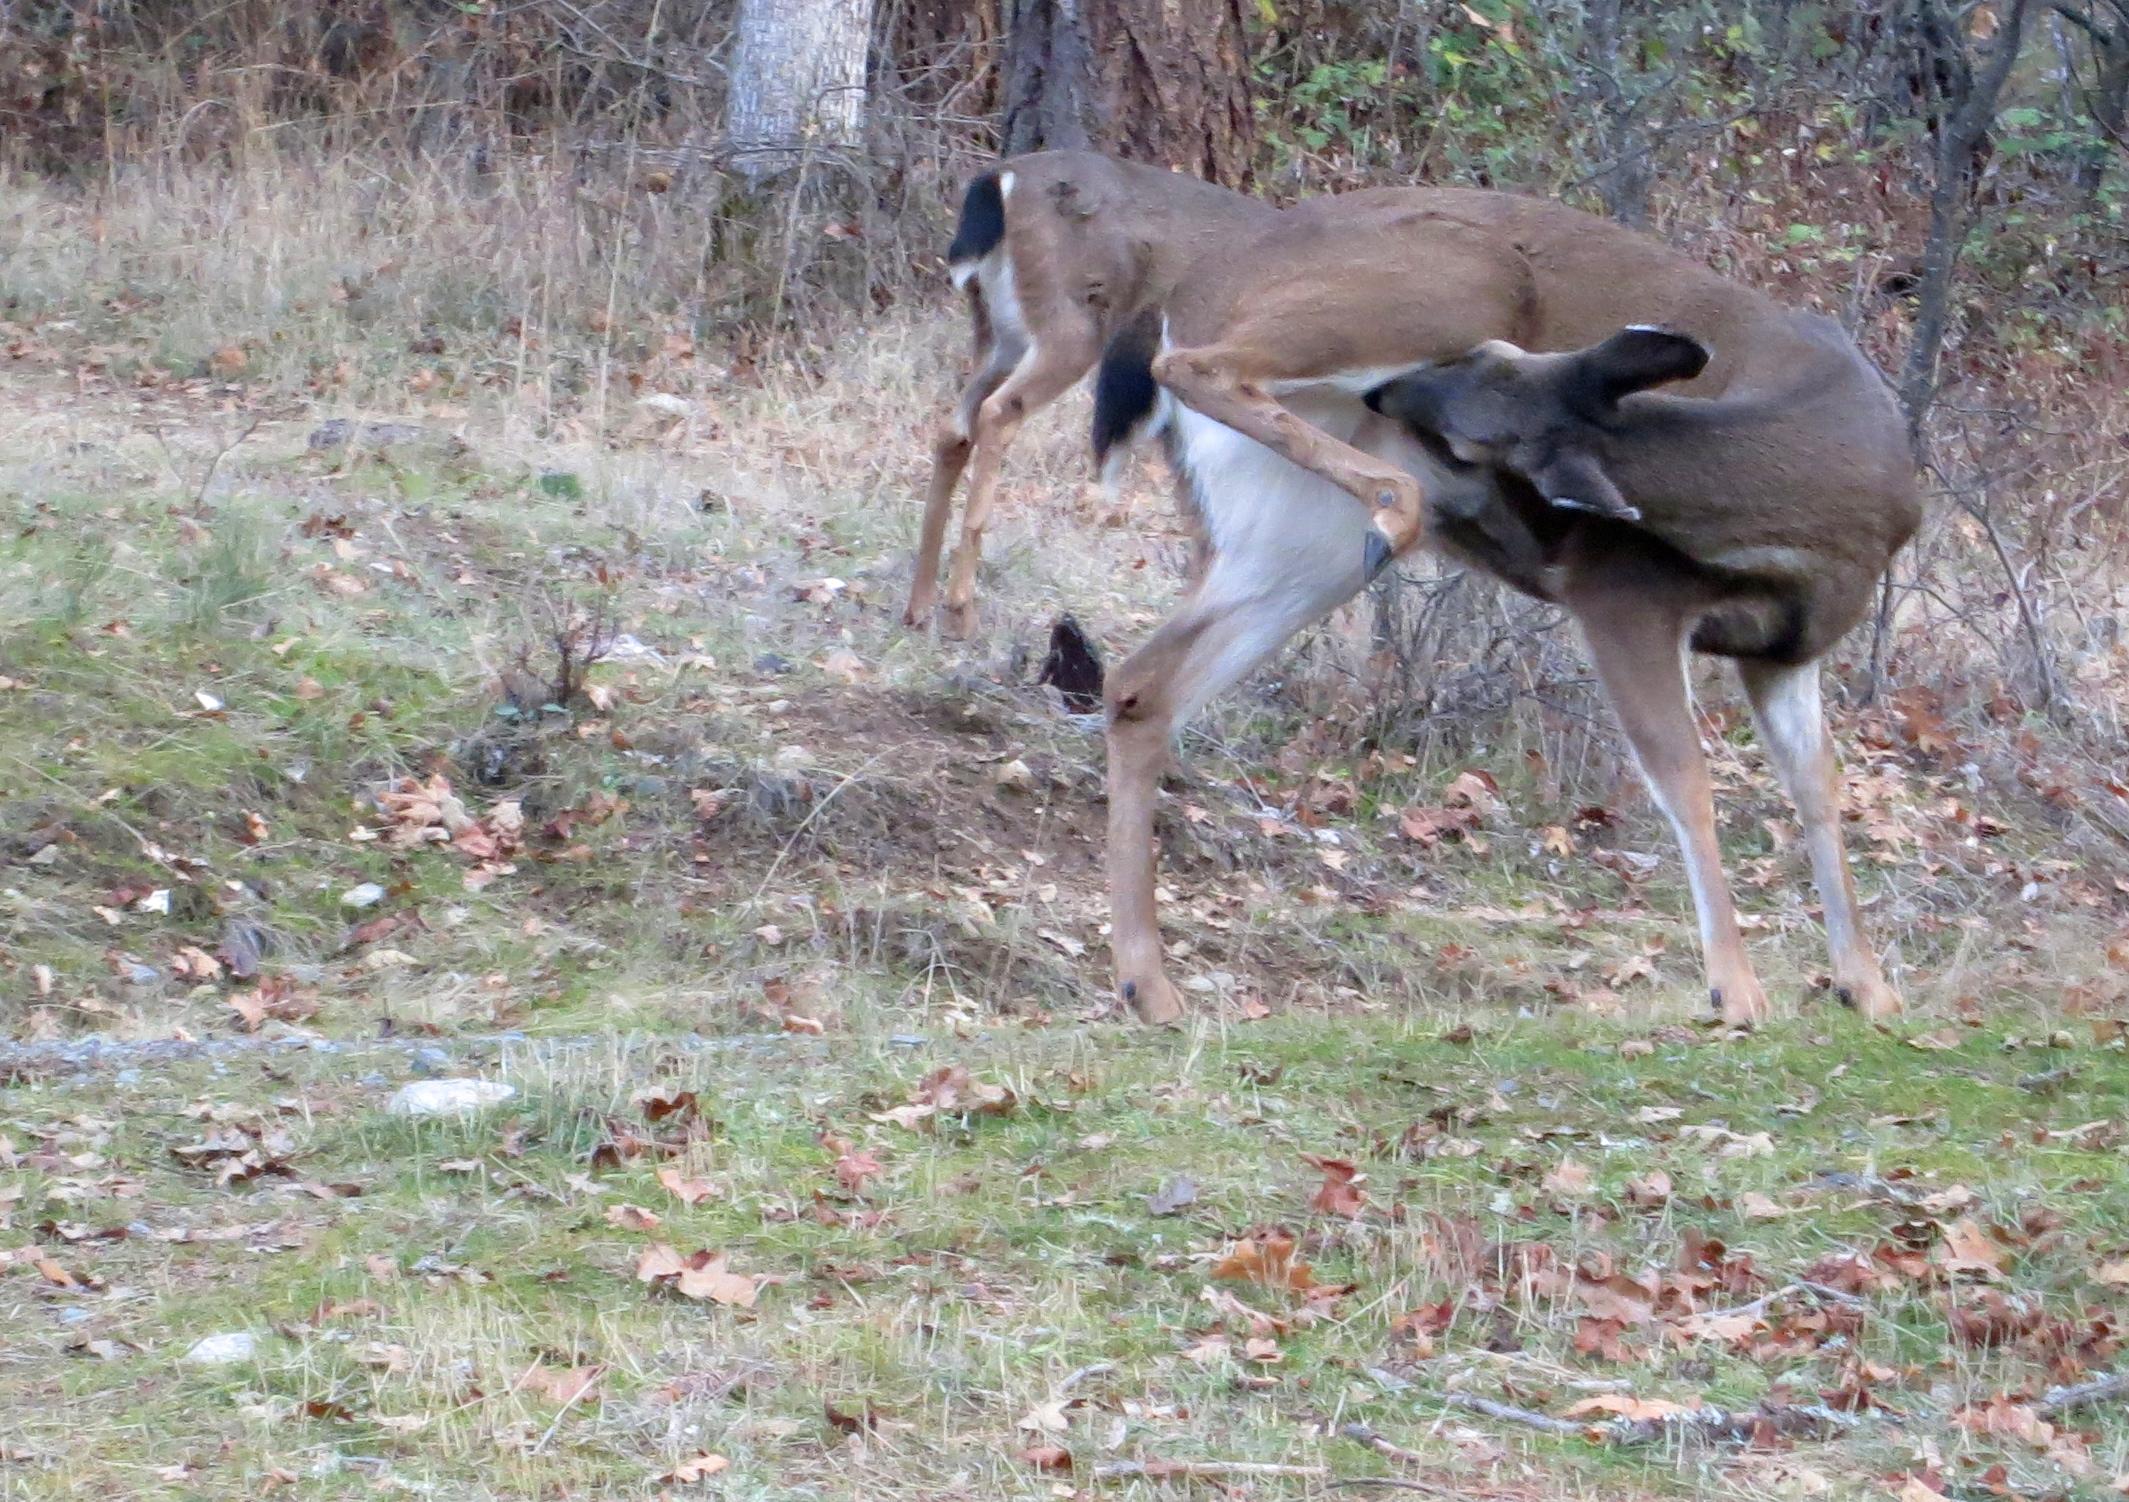 Blacktail deer scratches belly in Applegate Valley, Oregon. Photo by Curtis Mekemson.